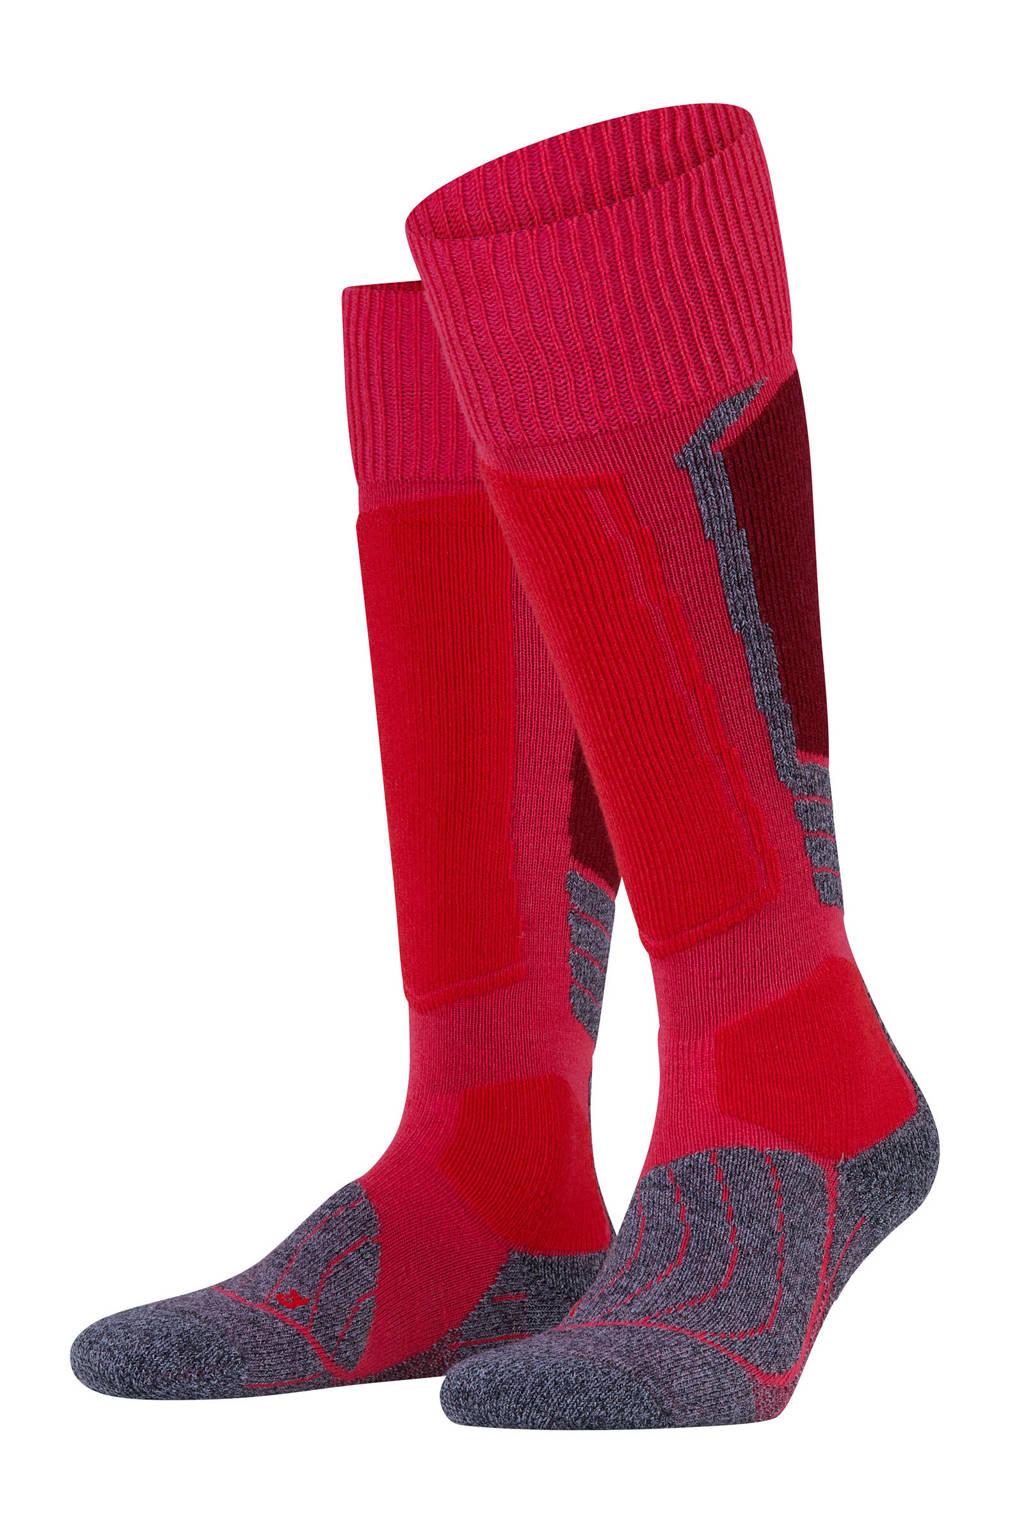 Falke Sport SK1 skikousen rood, Rood